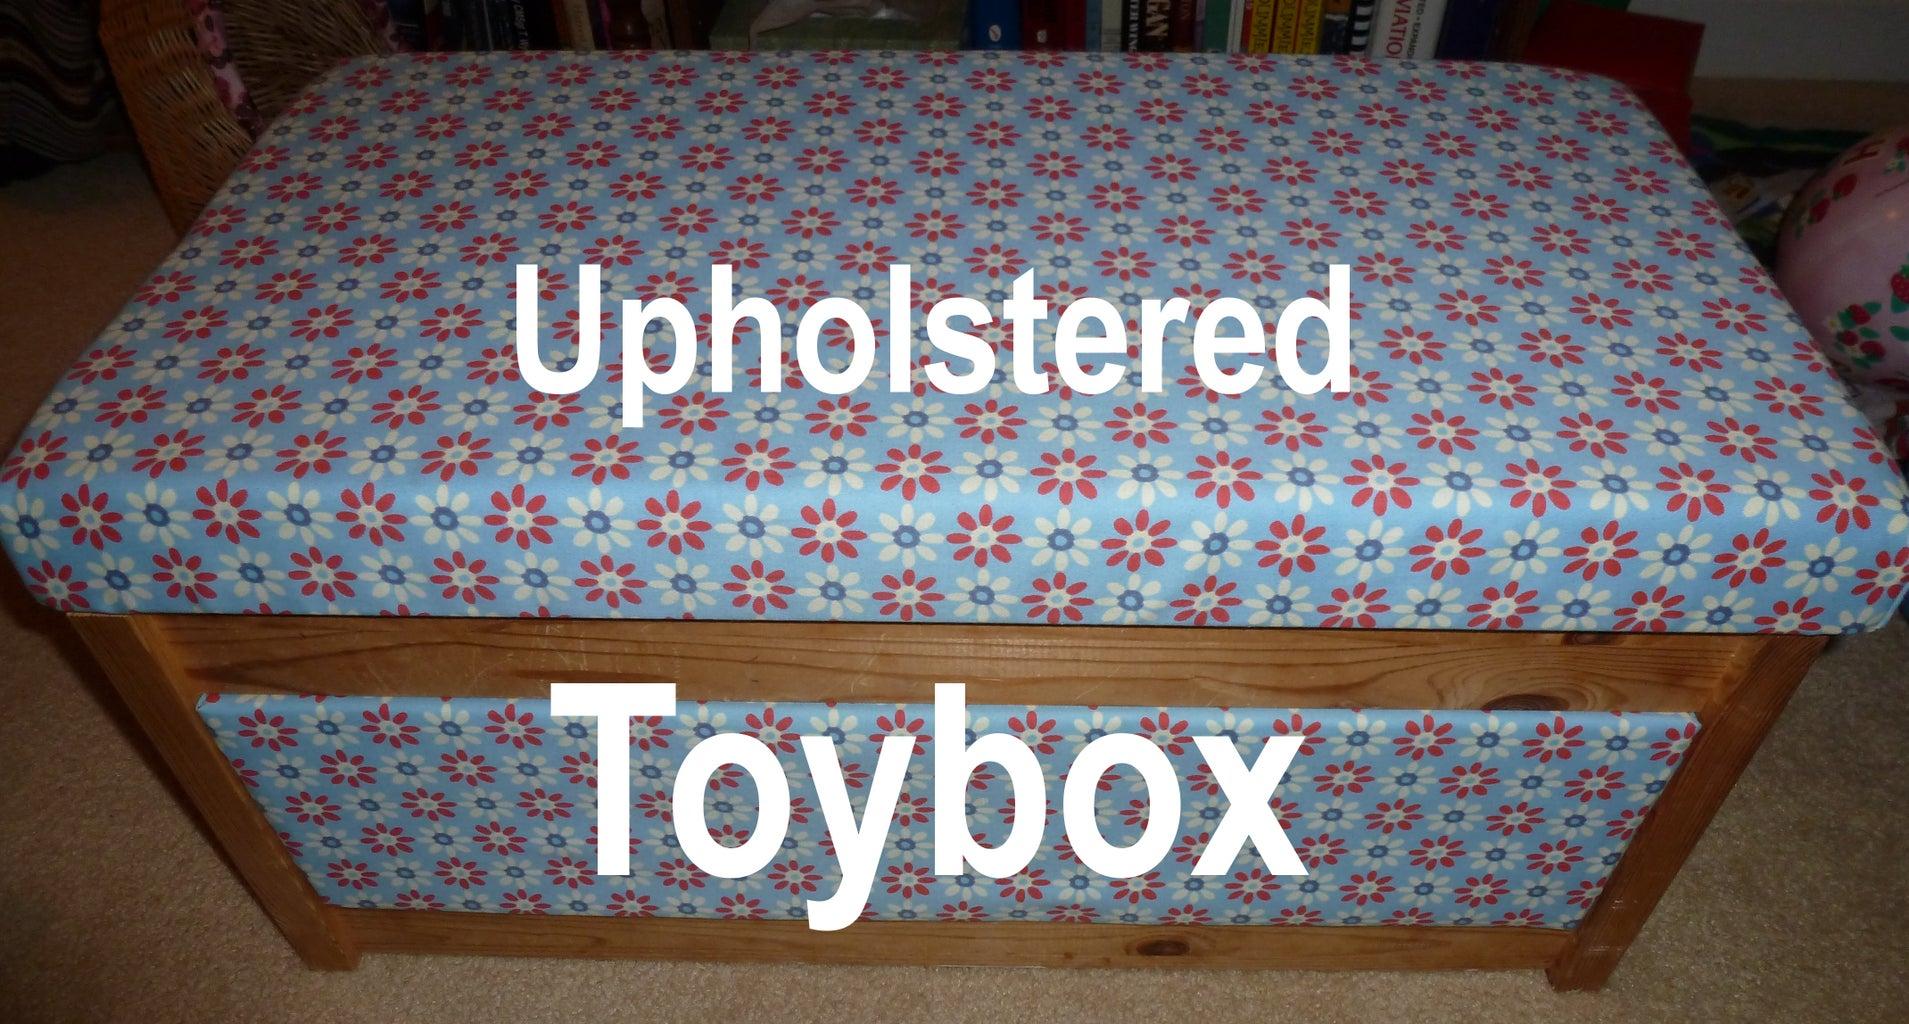 Upholster an Ikea Toybox